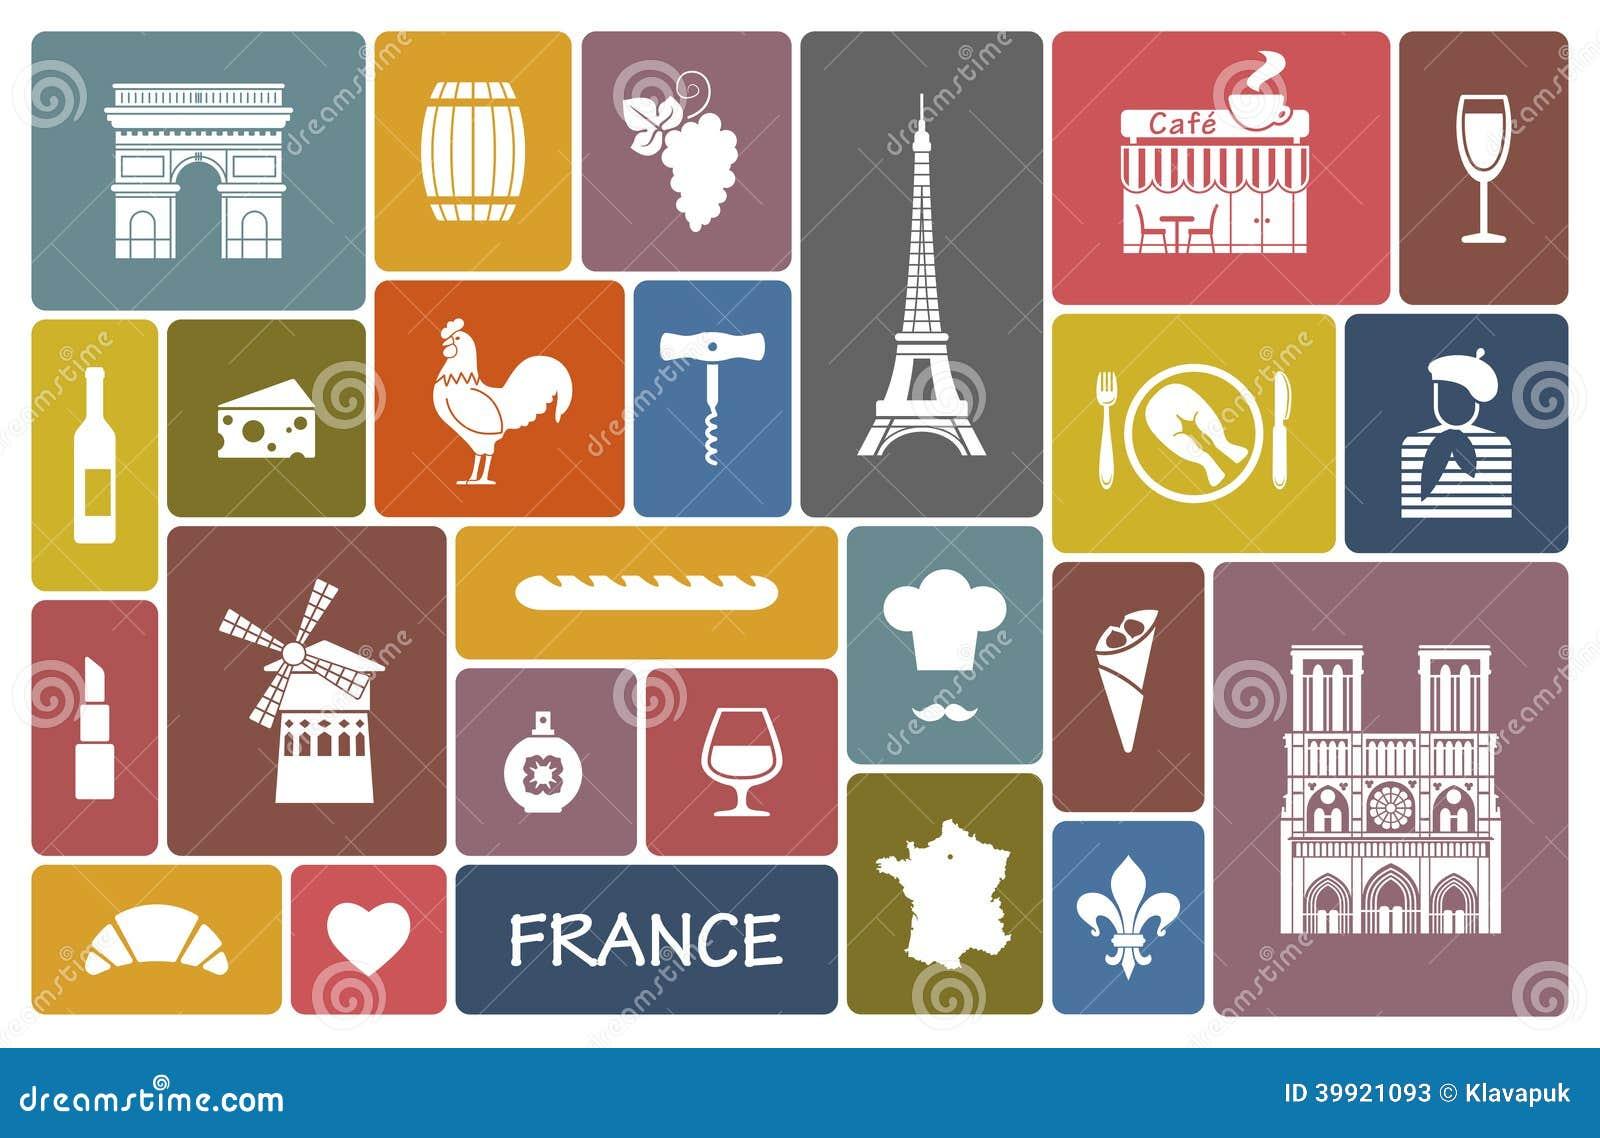 Symbols Of France Stock Vector Illustration Of Landmarks 39921093